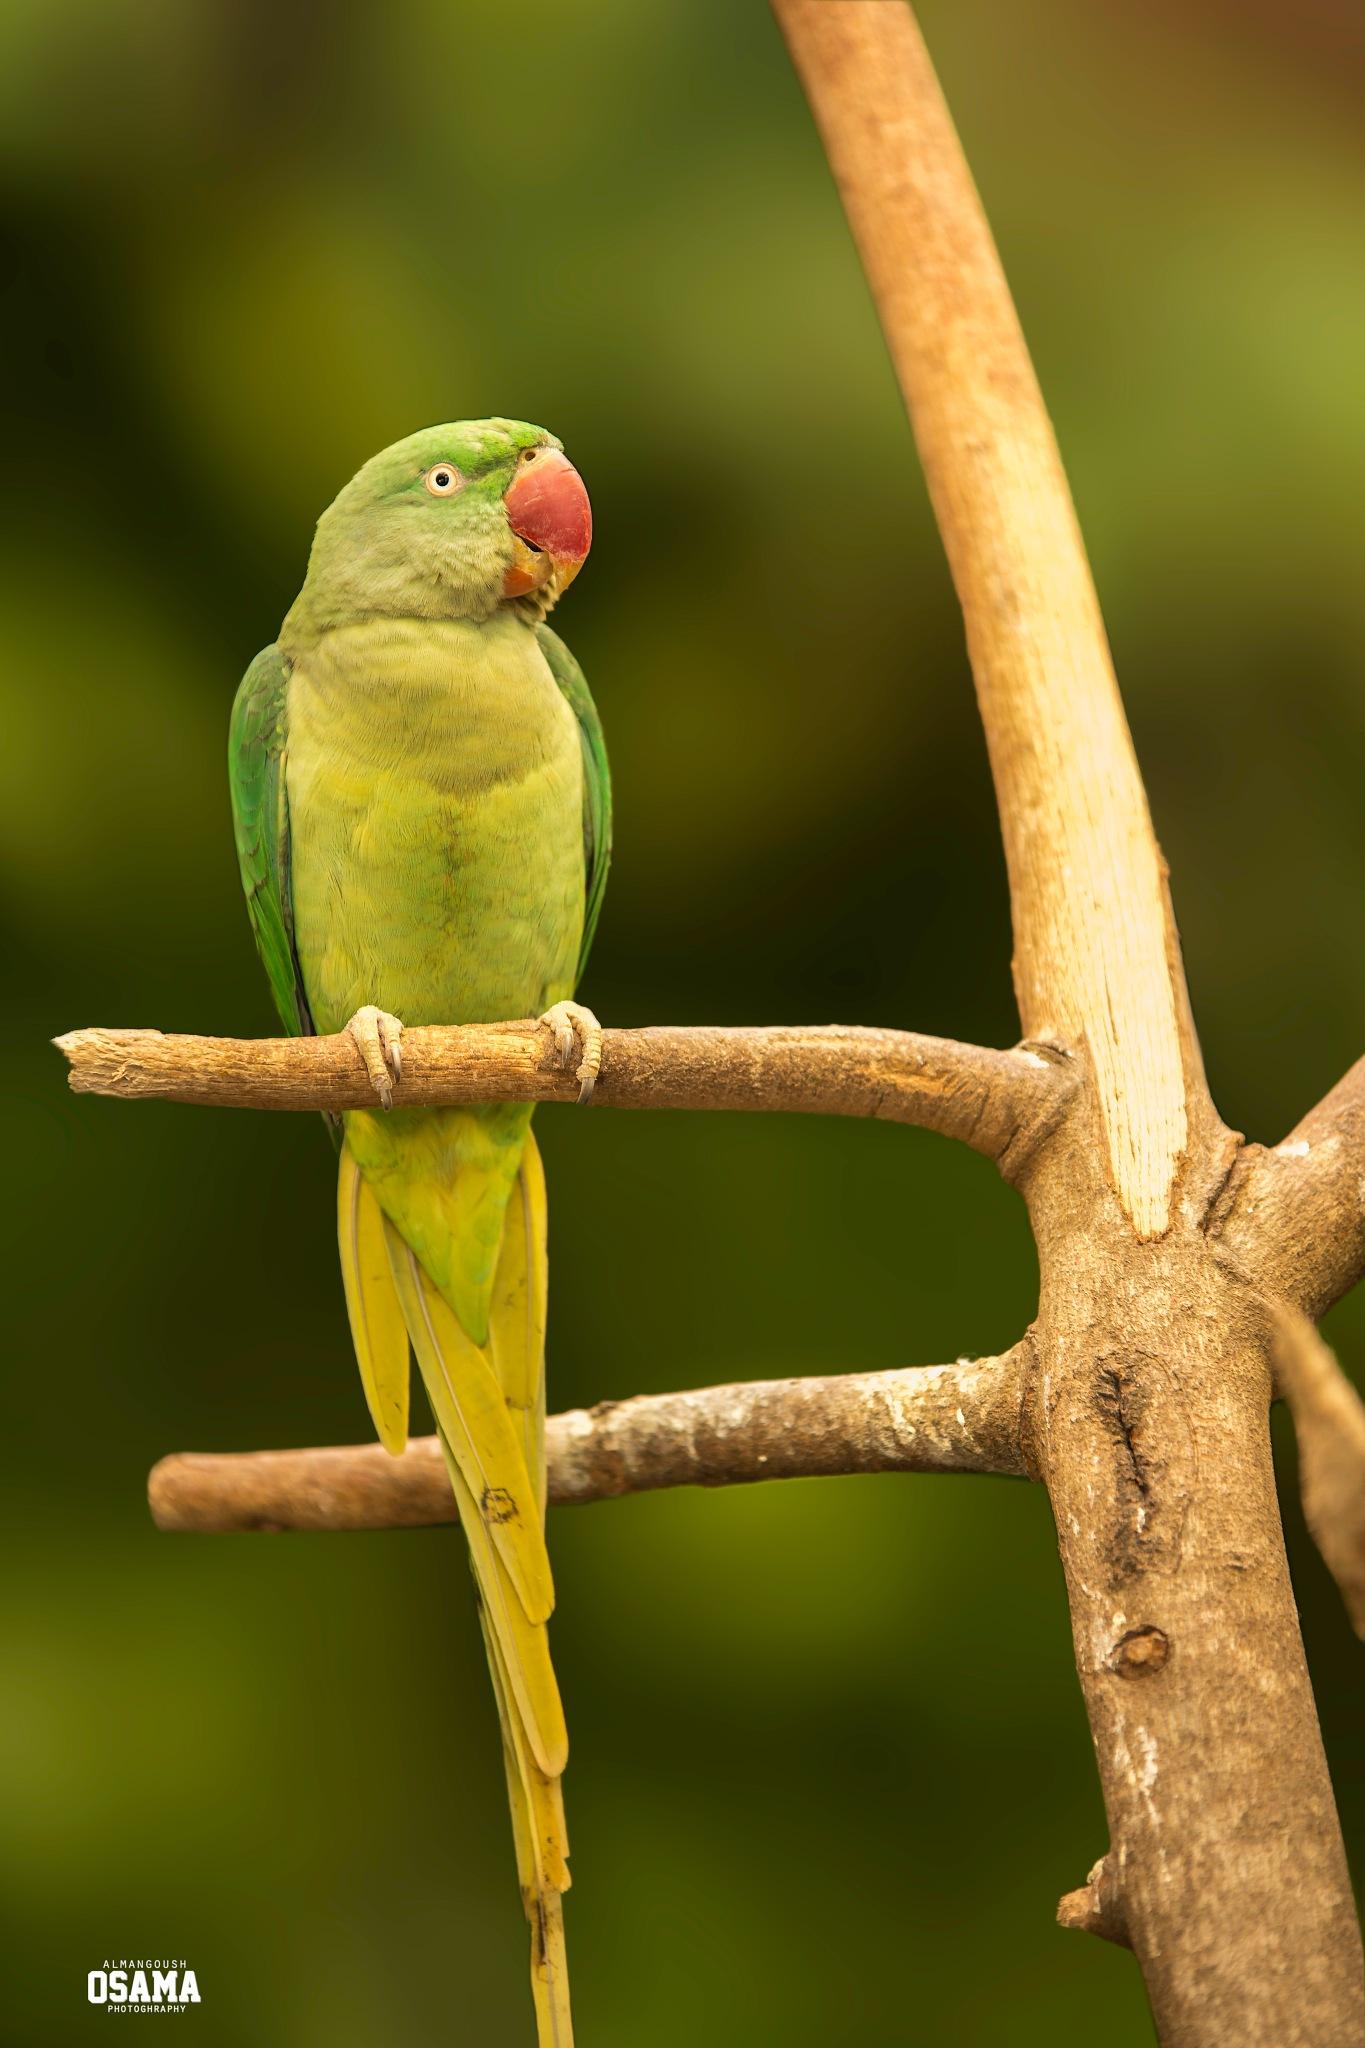 Beautiful bird by osama almngush